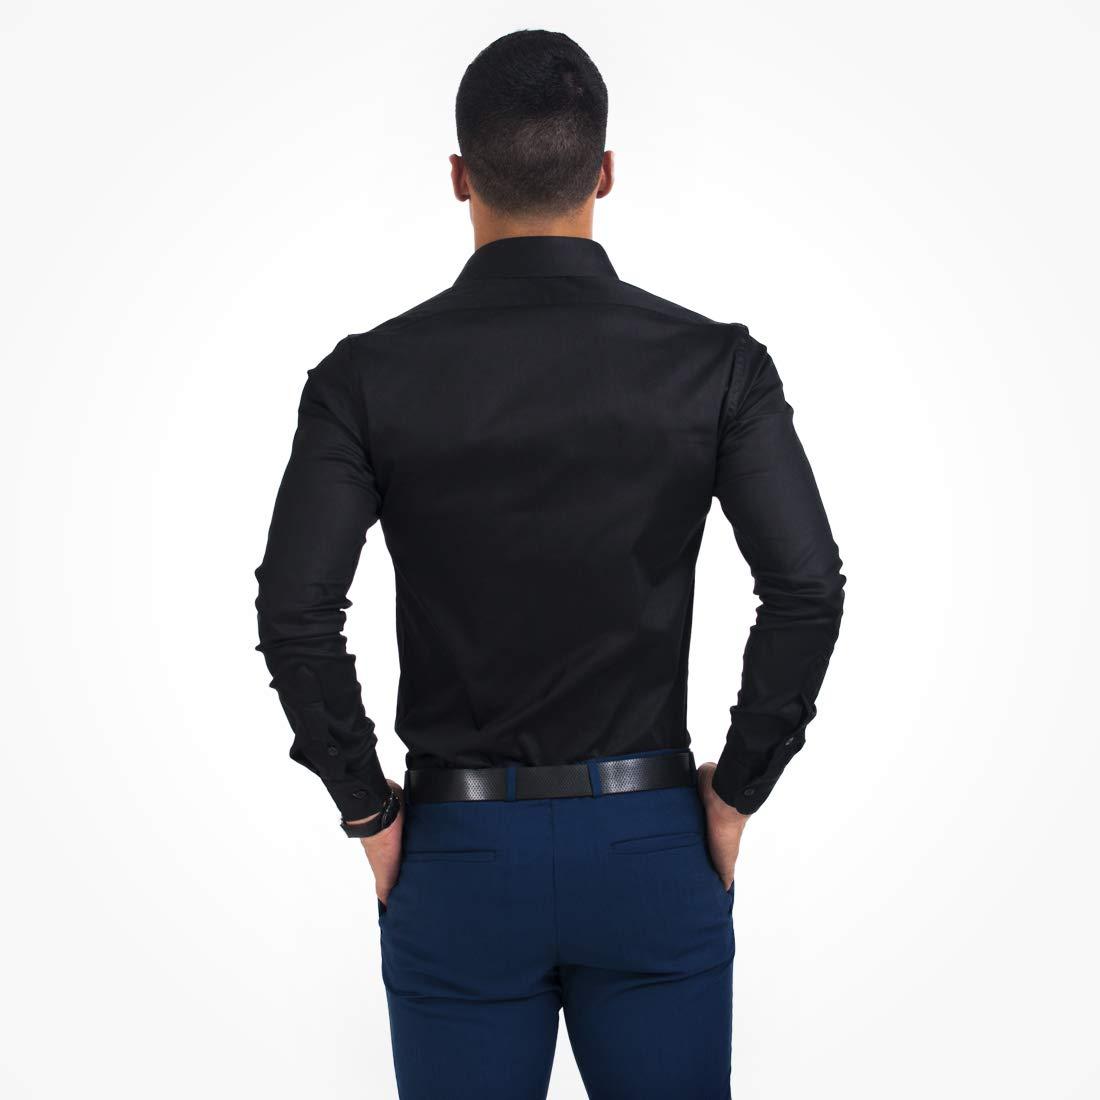 54cadd5a6c Camisa Social Masculina Preta Super Slim 200102  Amazon.com.br  Amazon Moda